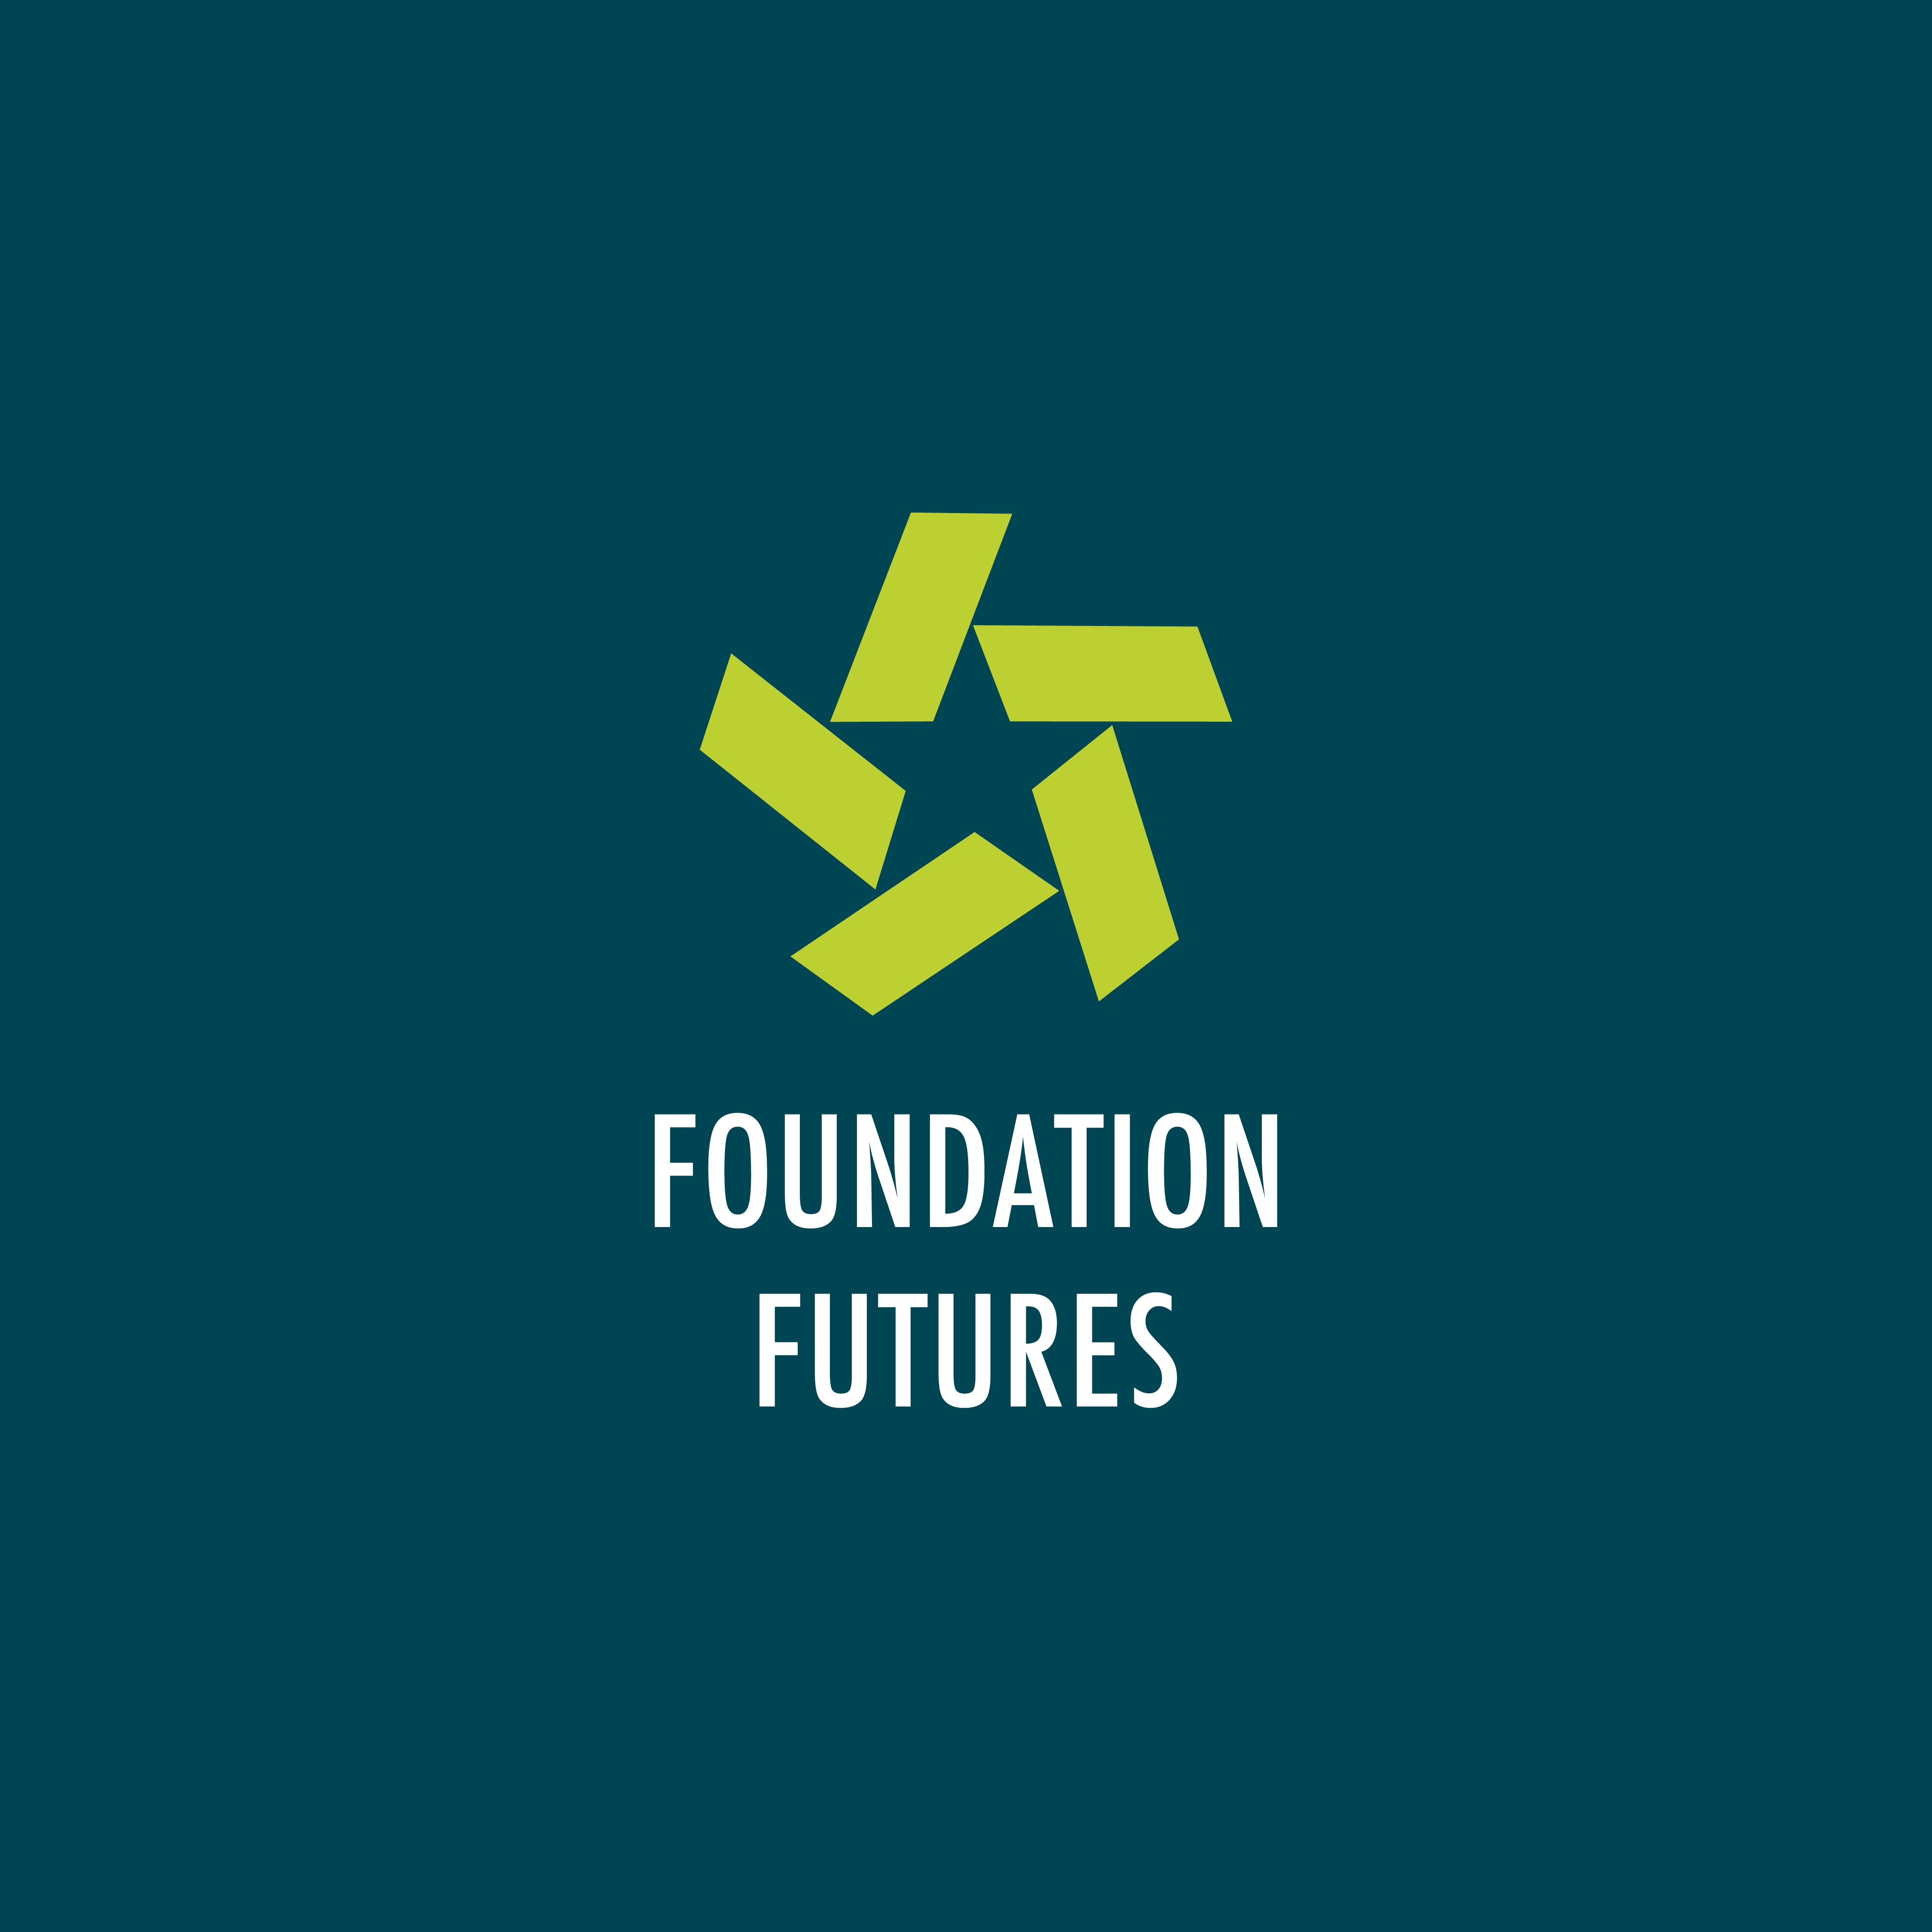 Foundation-futures-facebook ONLY -logo-01